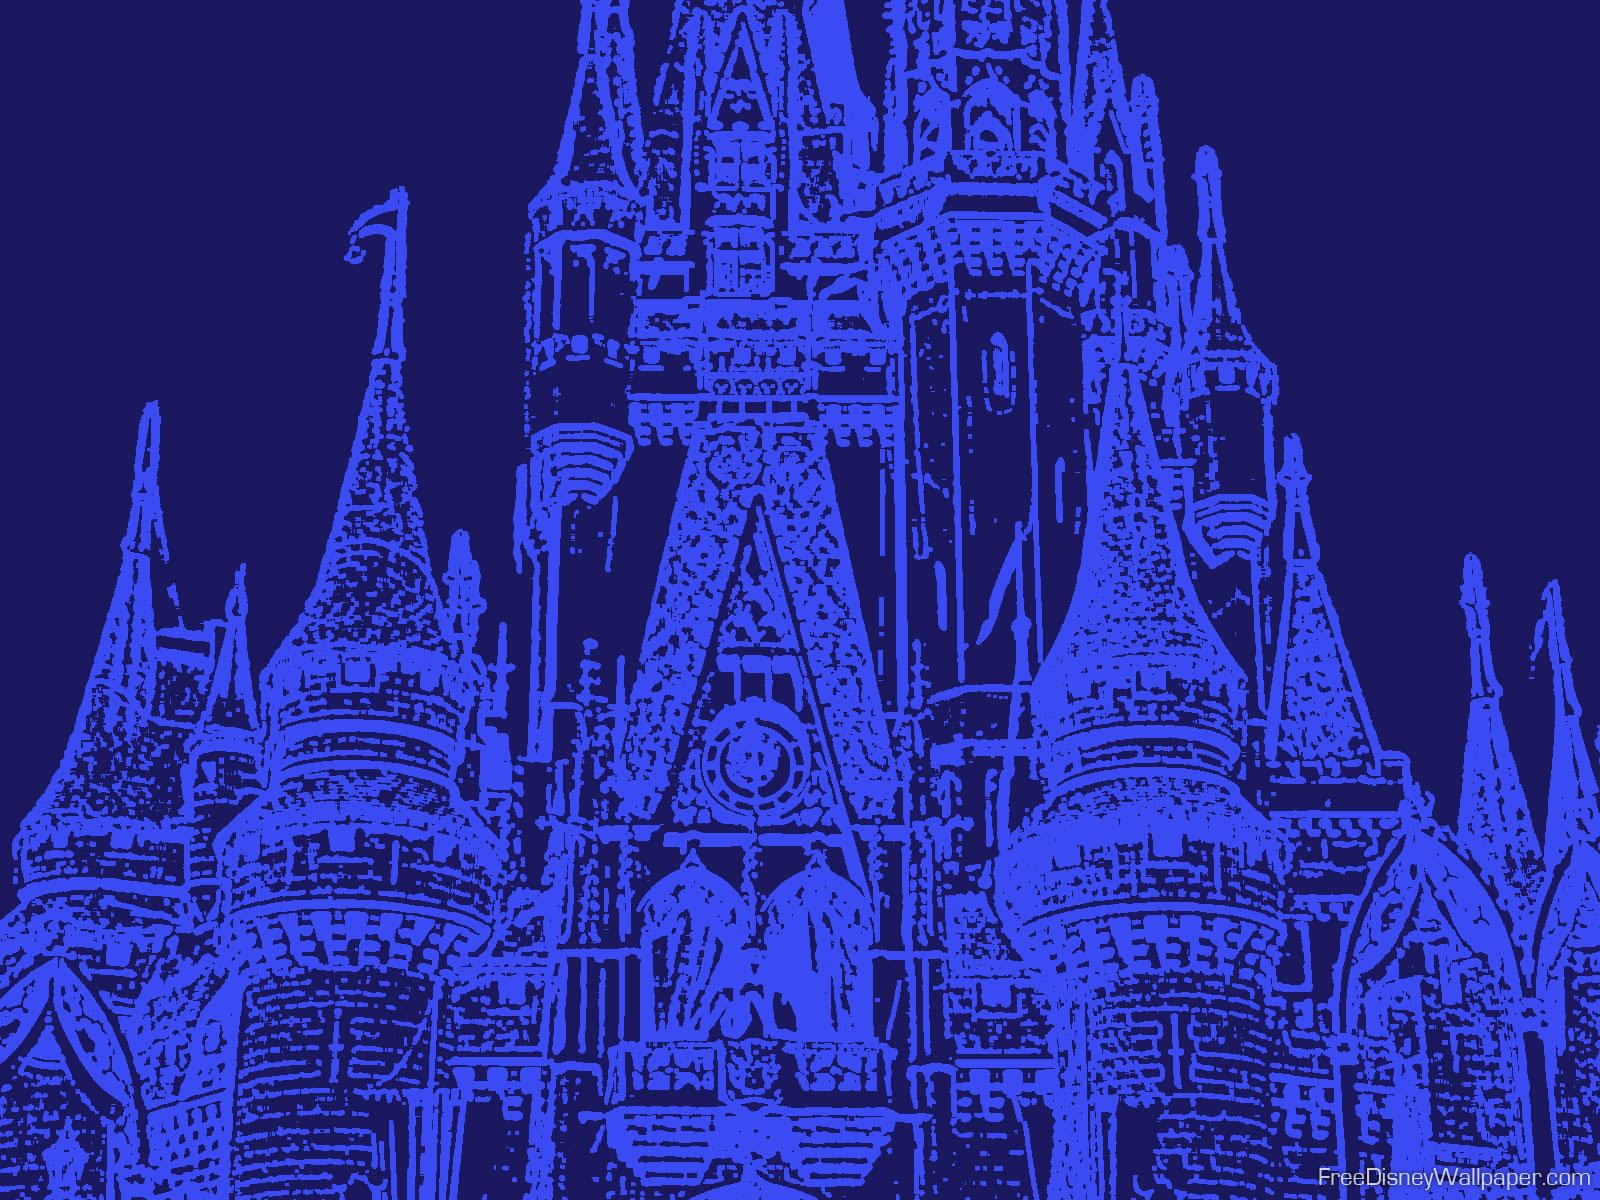 Disney Wallpaper Disney Wallpapers Cinderella Castle 1600x1200